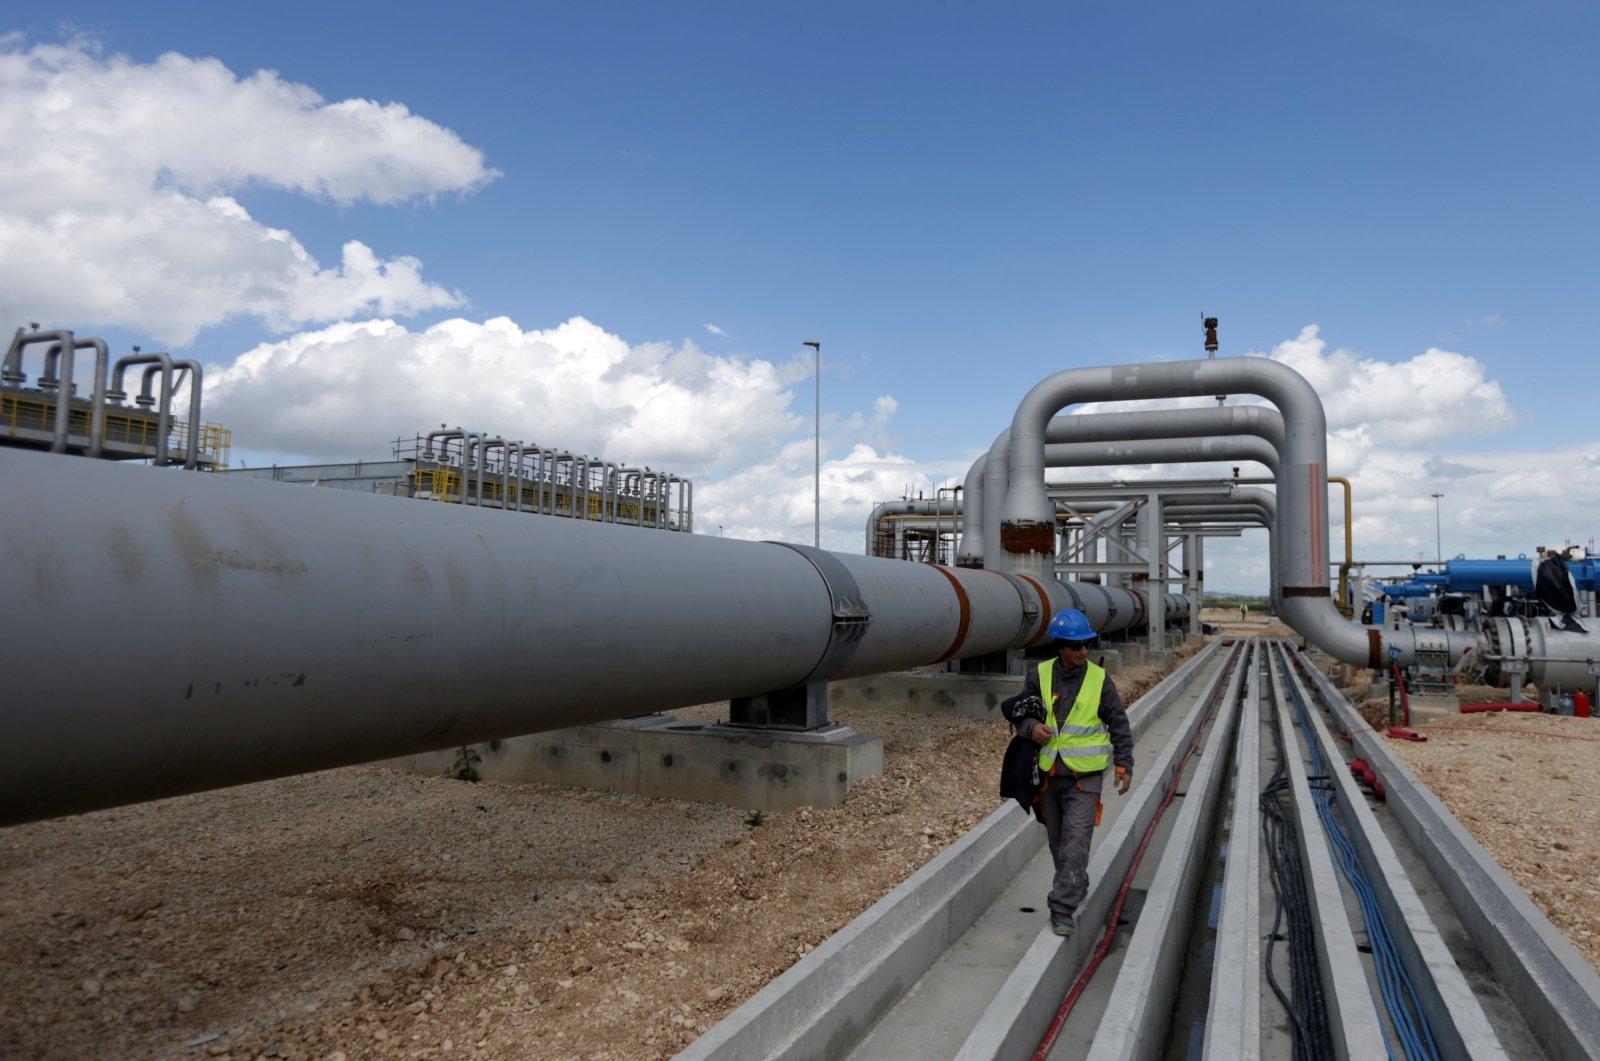 A local employe walks near a compressor station of the Trans Adriatic Pipeline (TAP) in Seman near Fier, Albania April 11, 2019. (Reuters Photo)